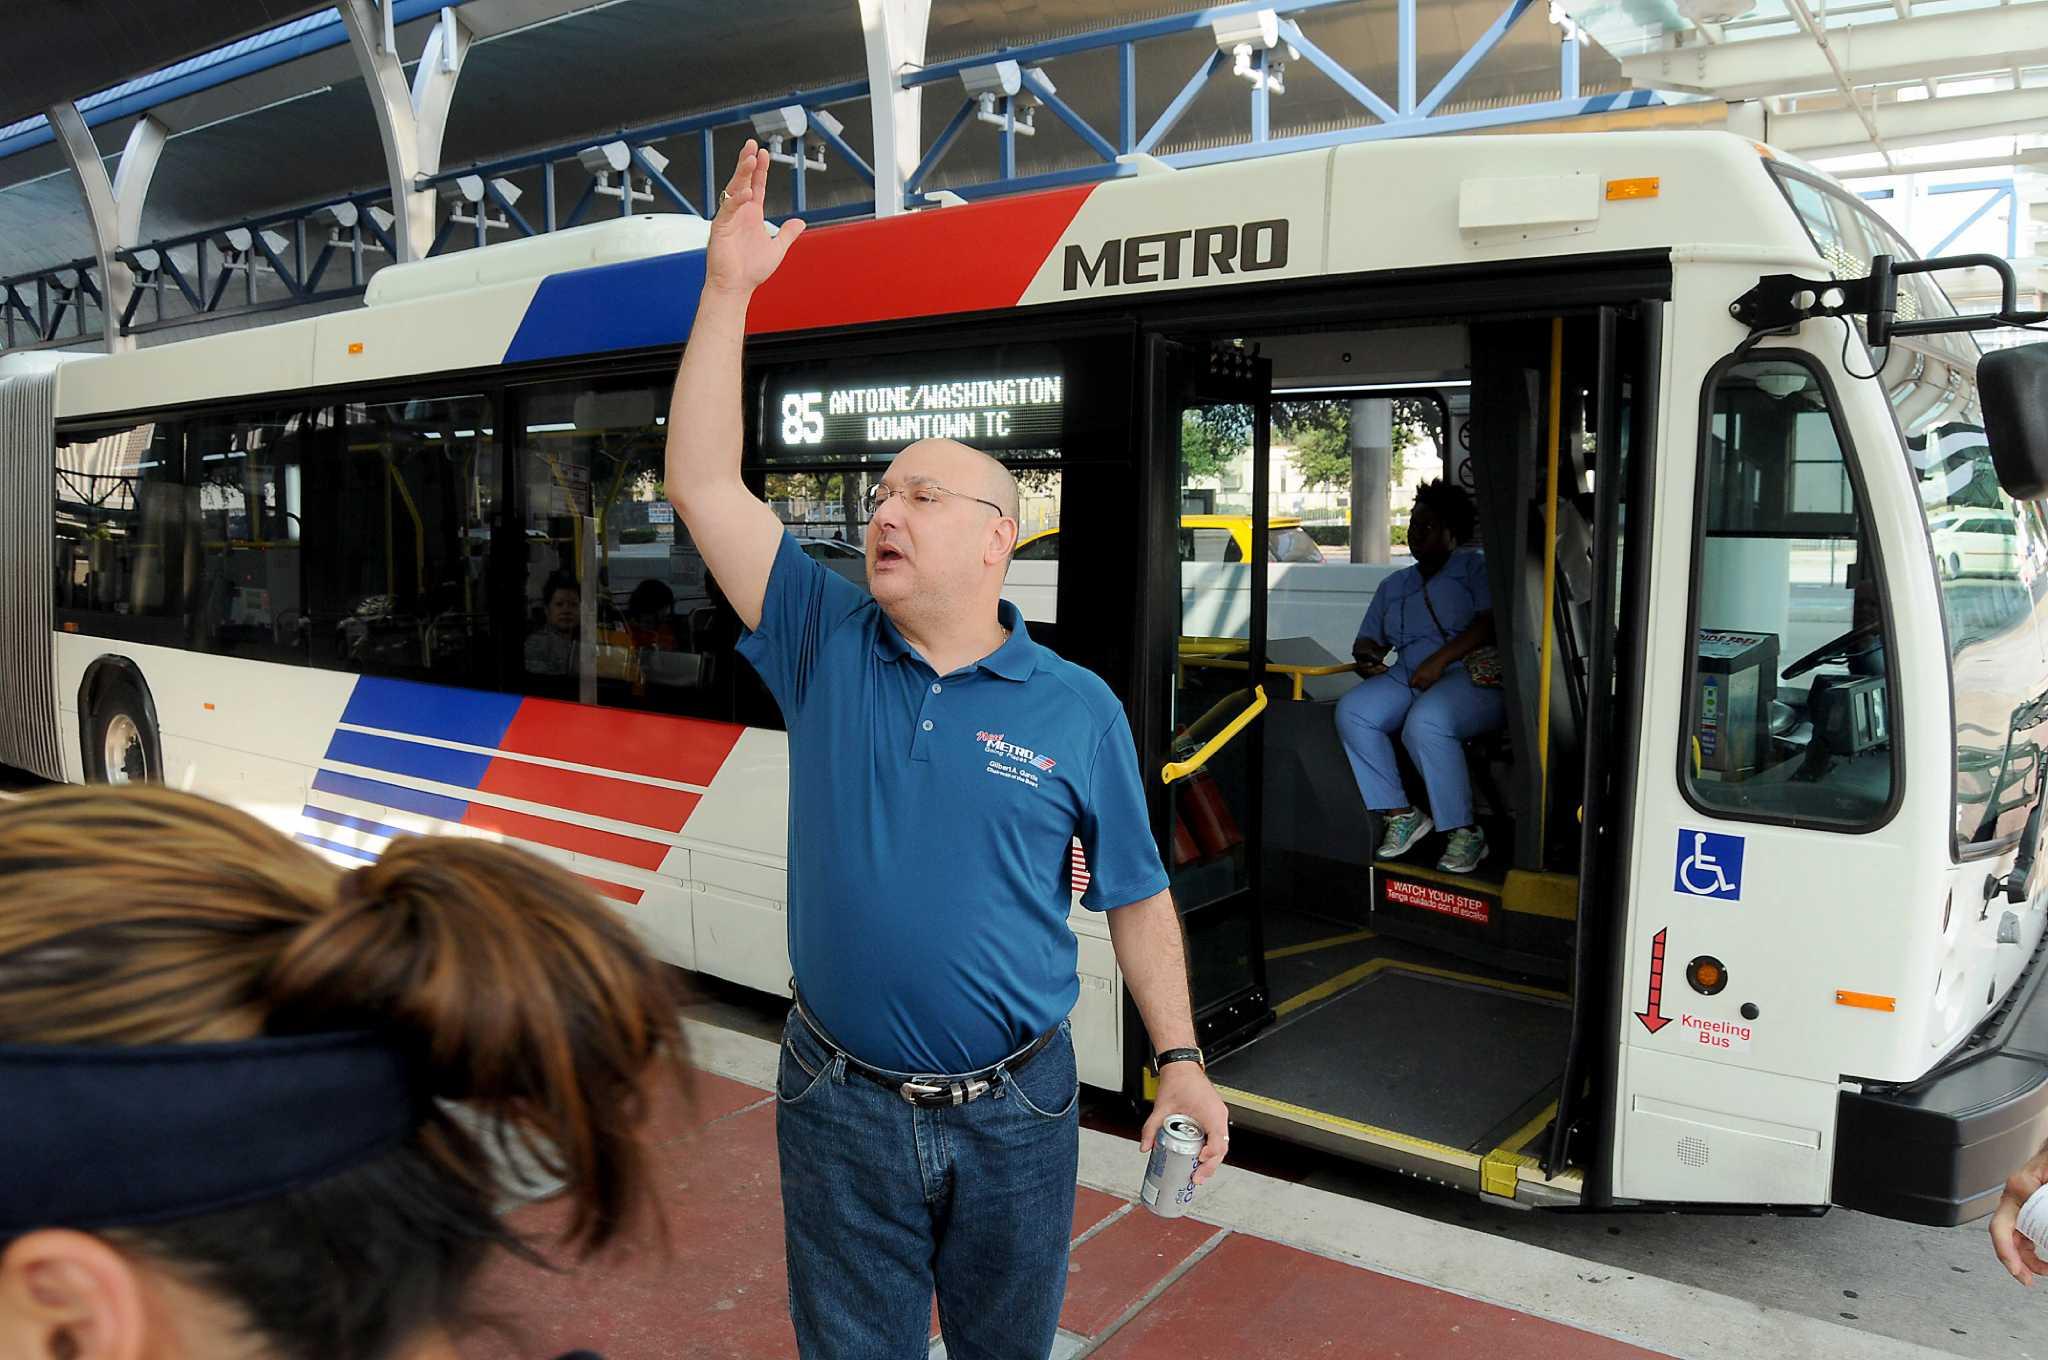 Essay ways to improve bus services